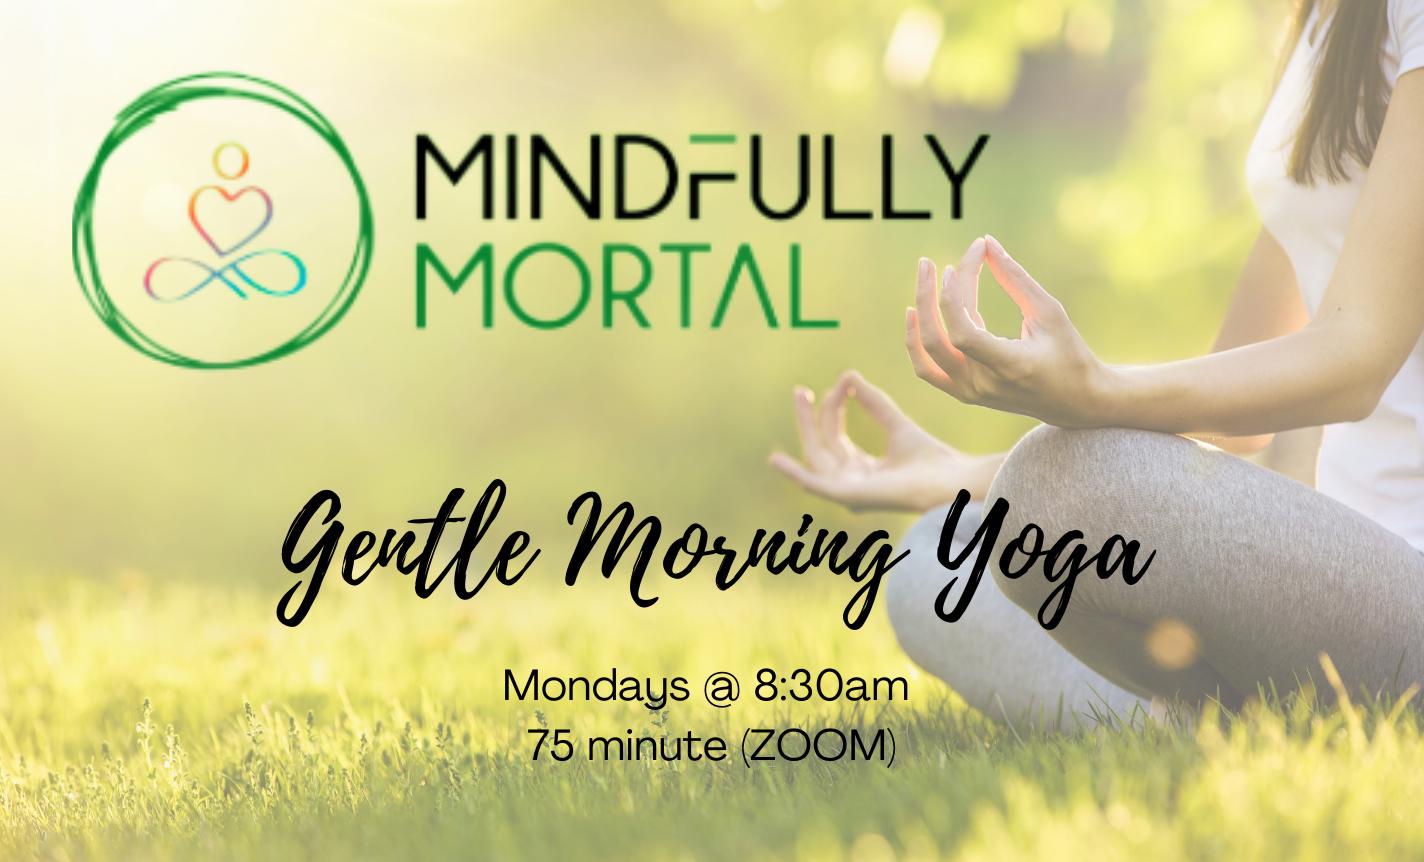 Mindfully Mortal Mondays: Gentle Yoga w/ Ken Breniman